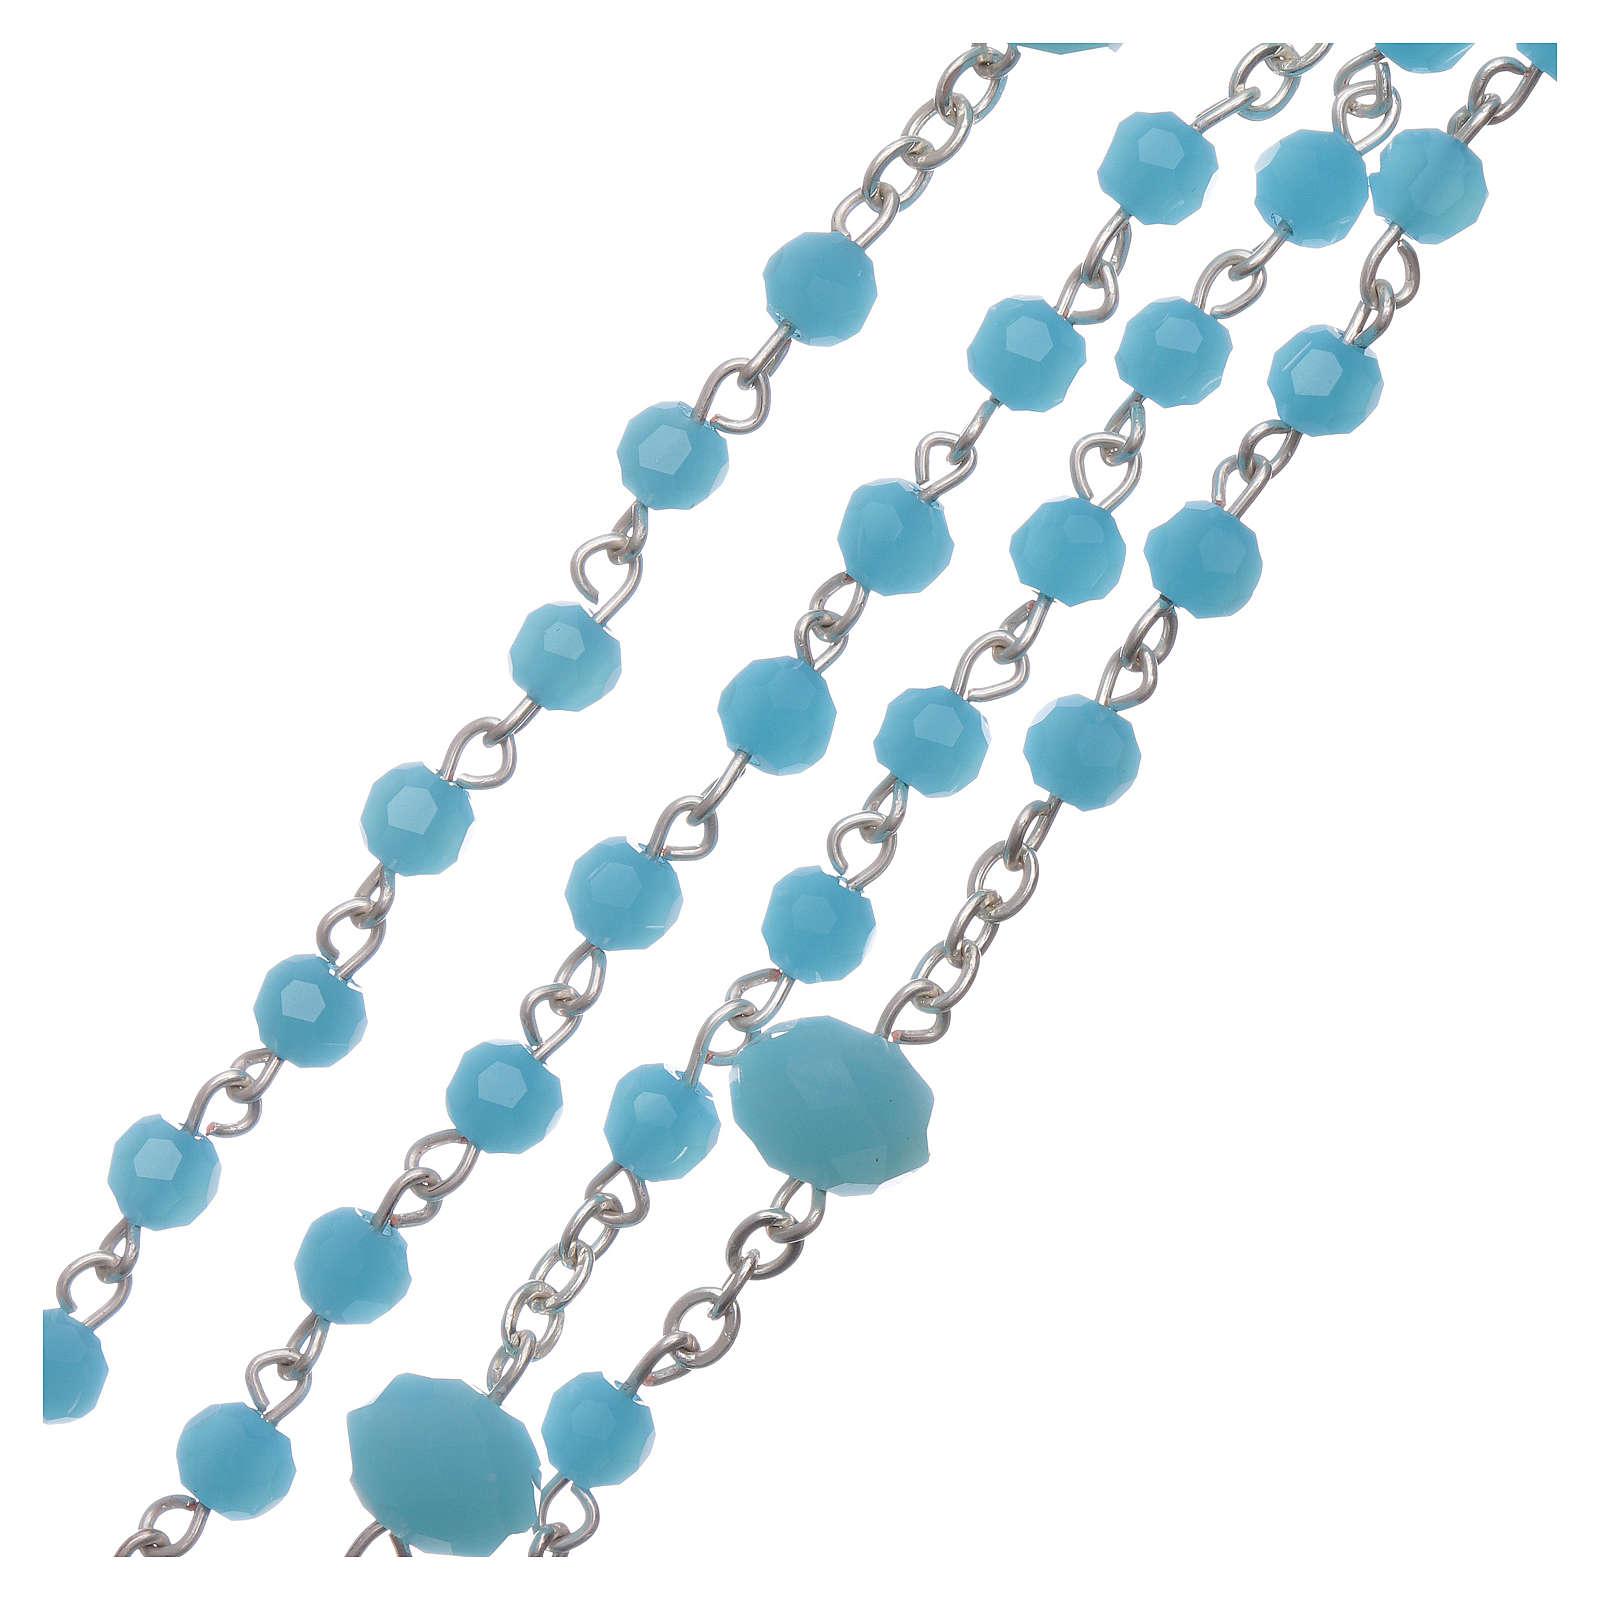 Chapelet collier Medjugorje cristal bleu clair 4 mm 4